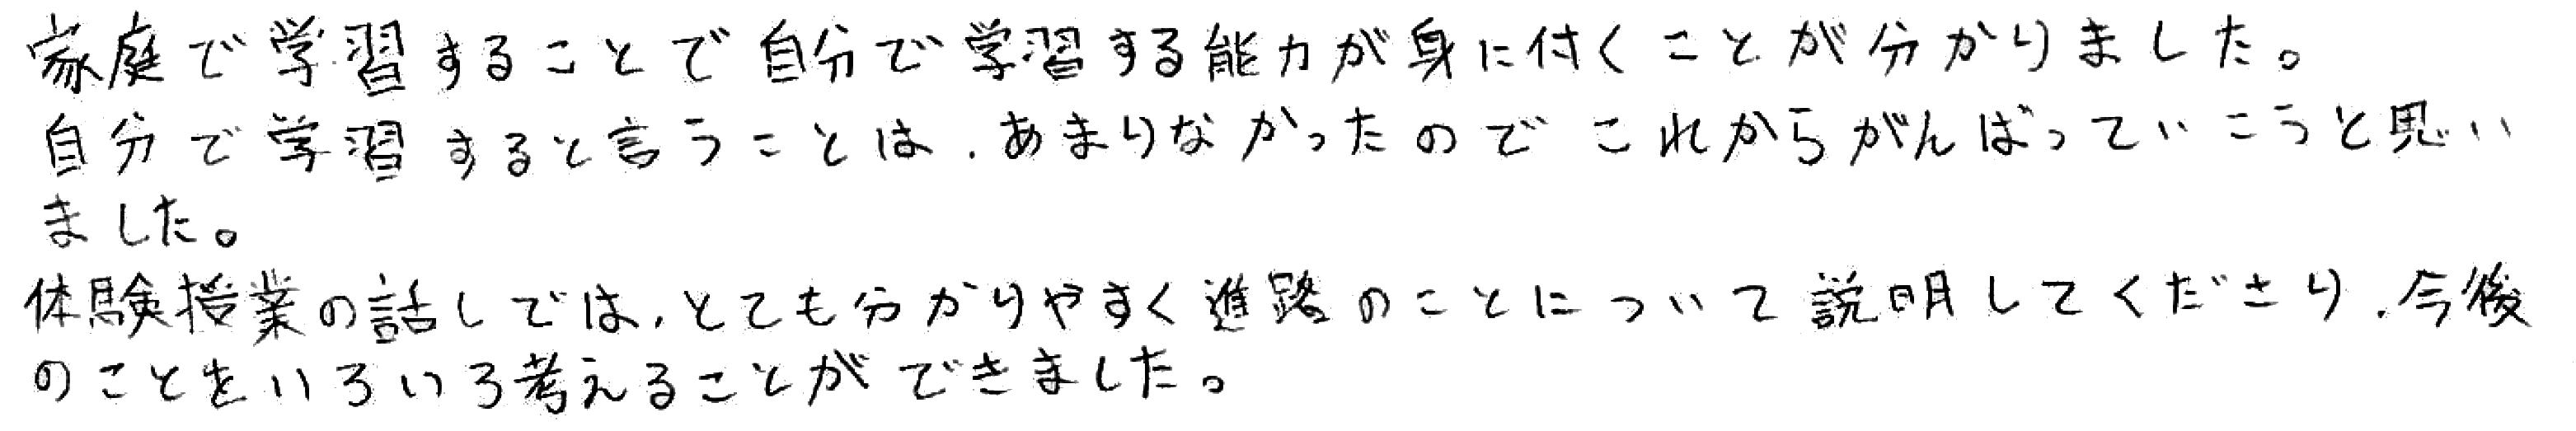 Y君(江南市)からの口コミ